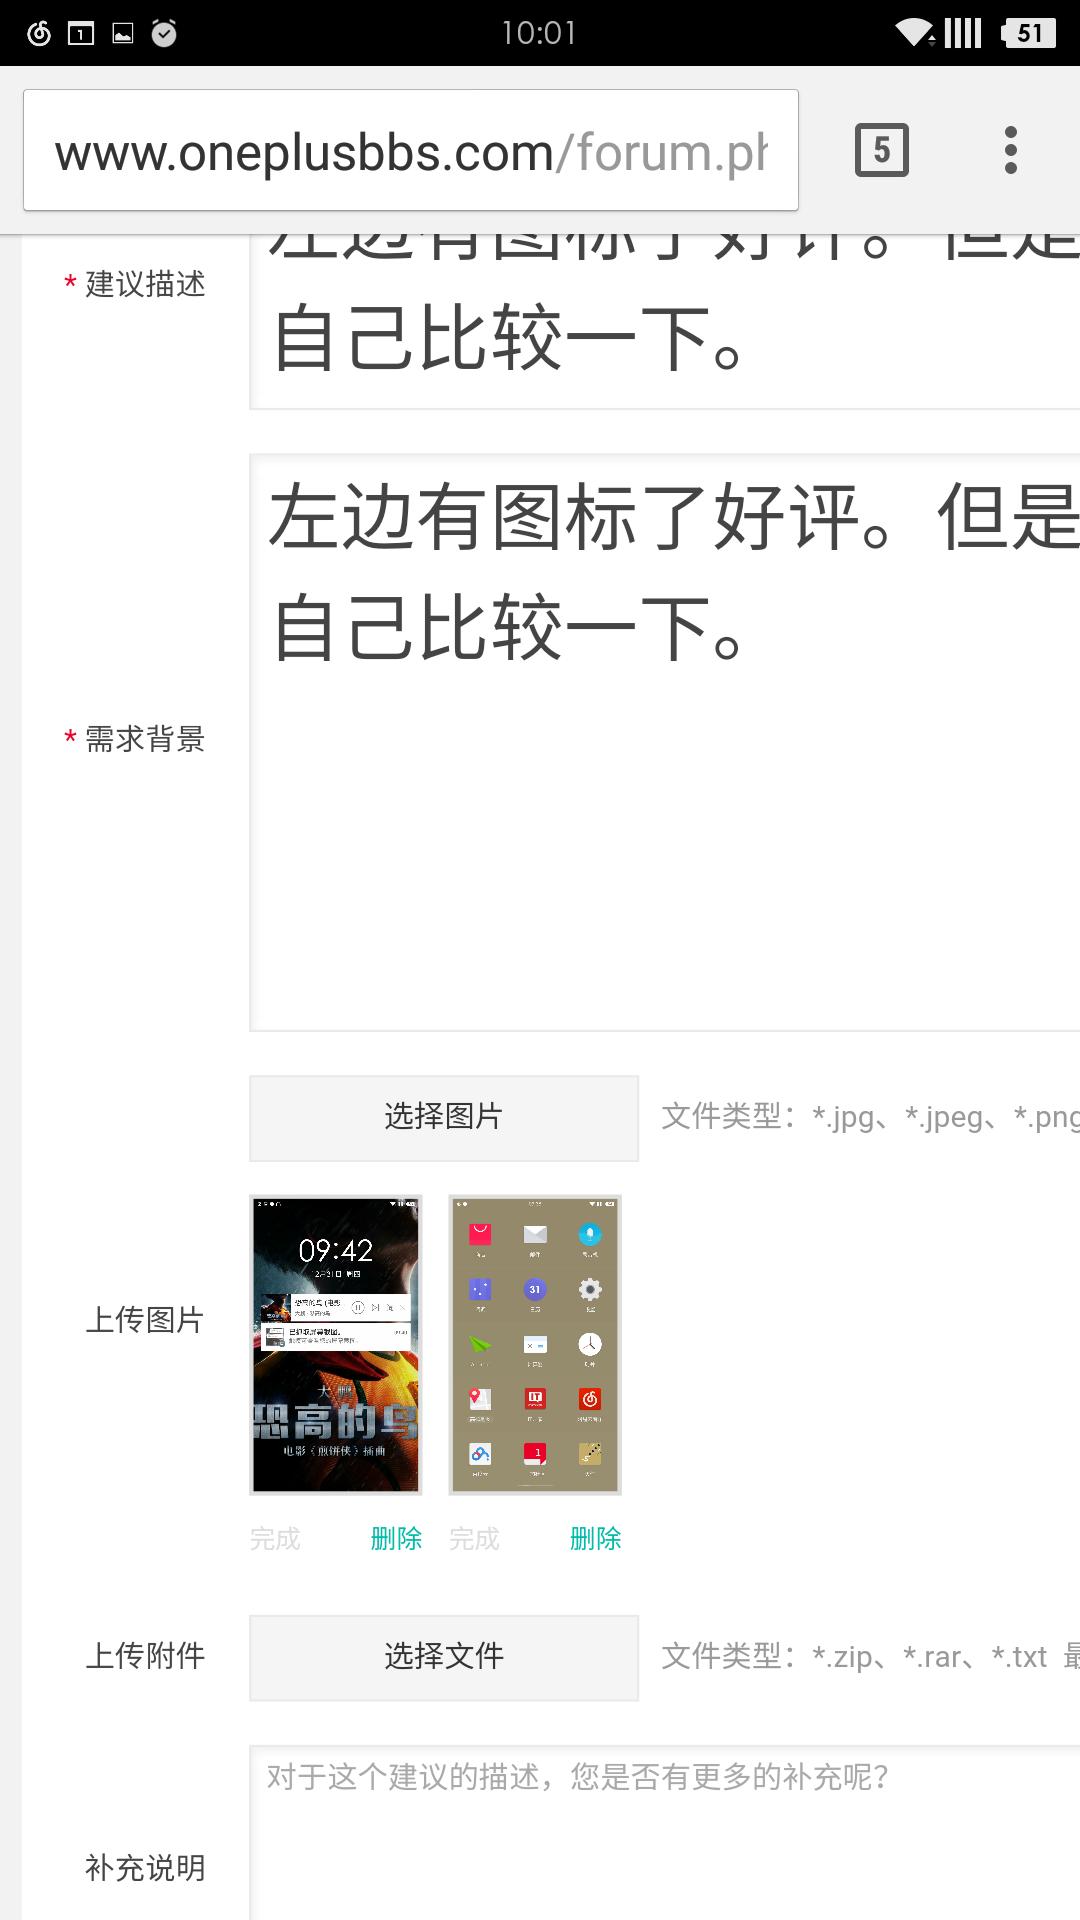 Screenshot_2015-12-31-10-01-14.png